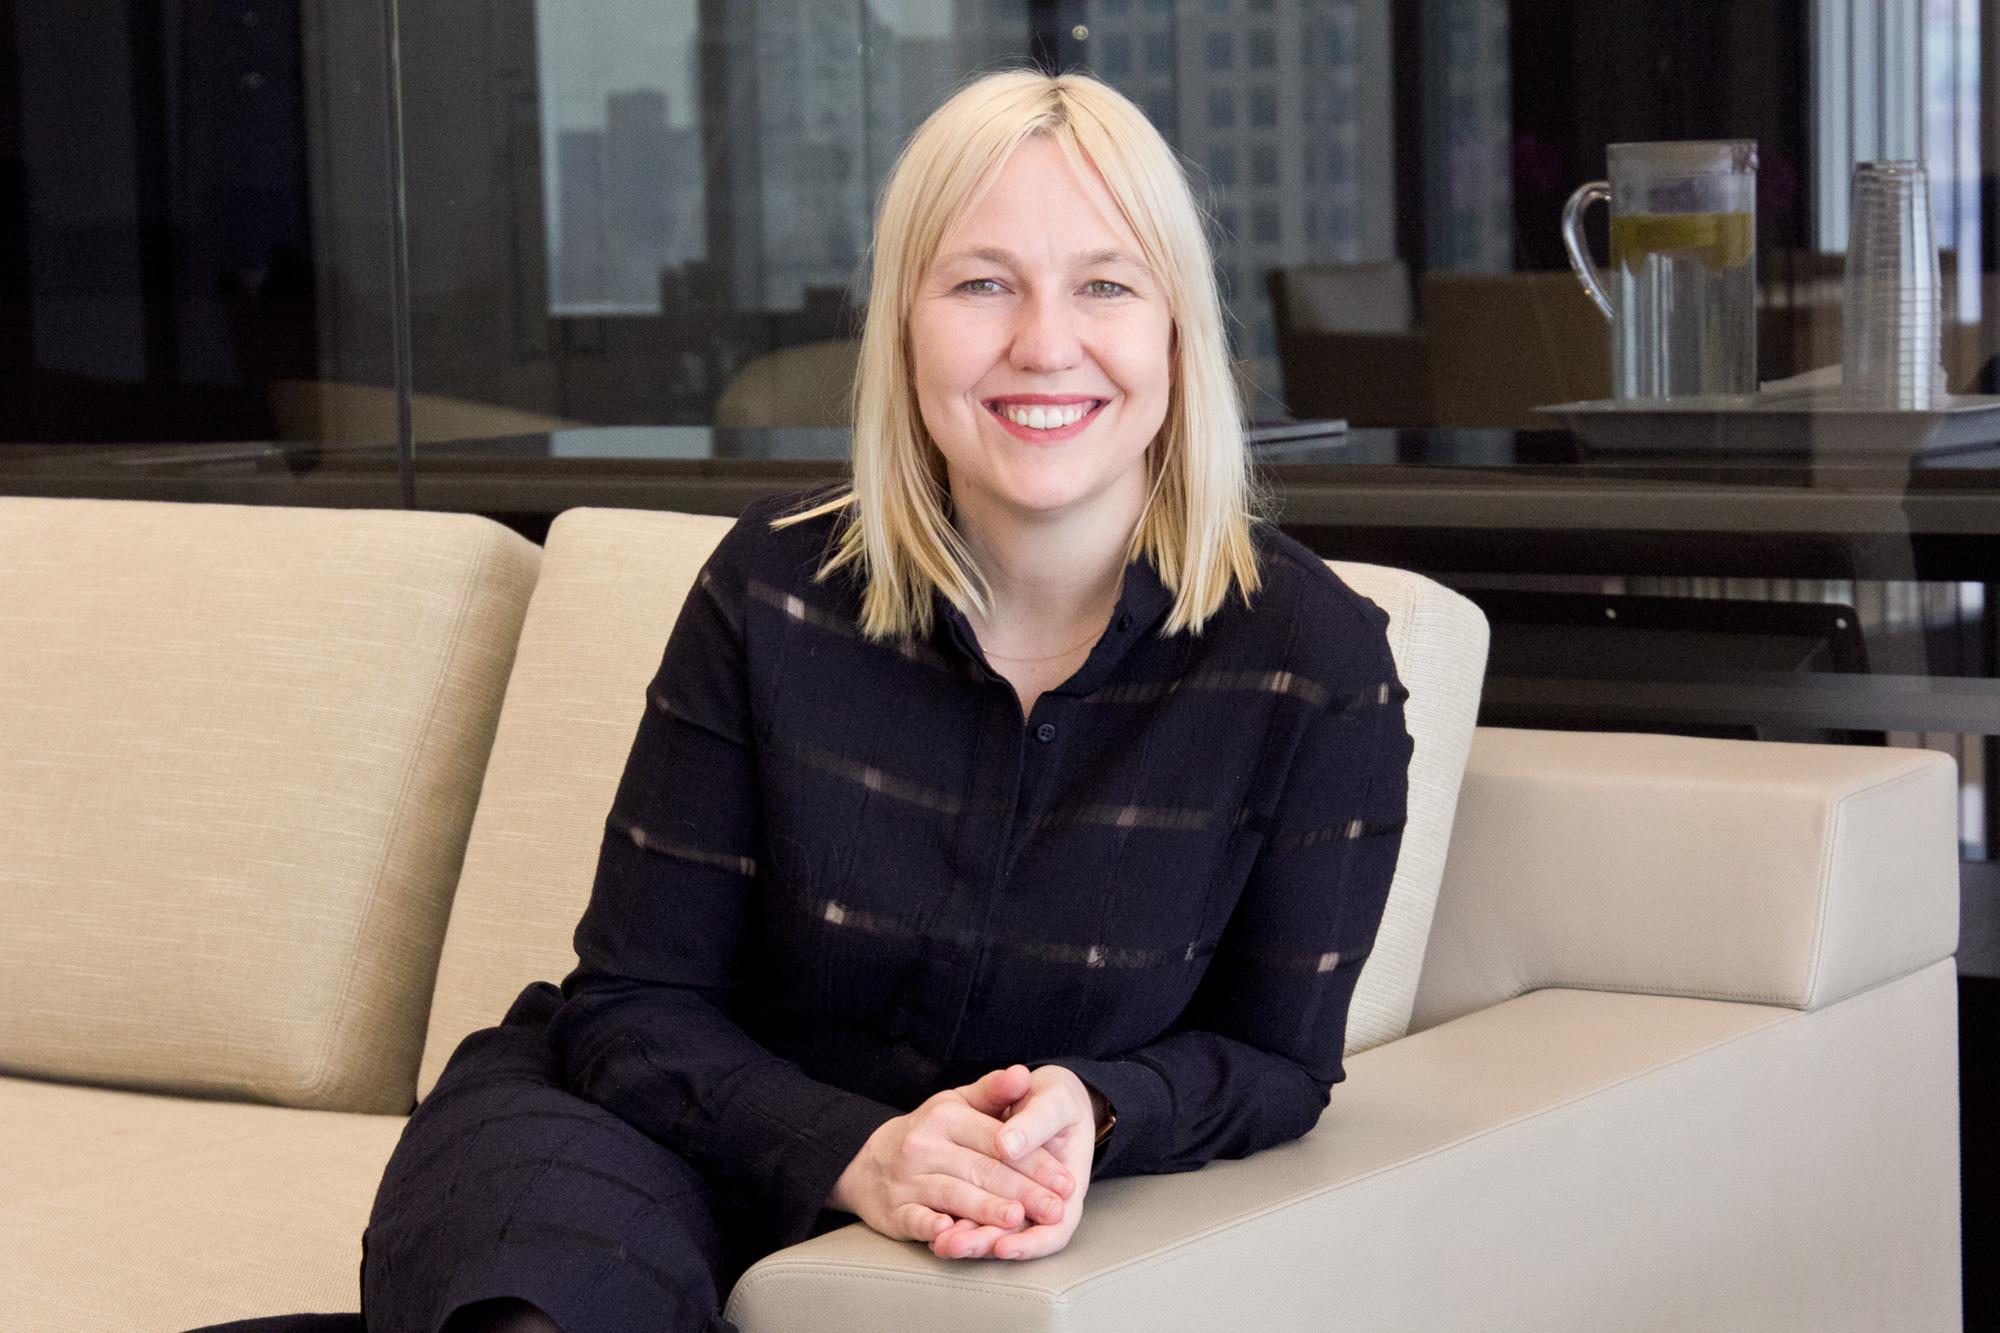 Conde Nast Traveler executive editor, Candice Rainey